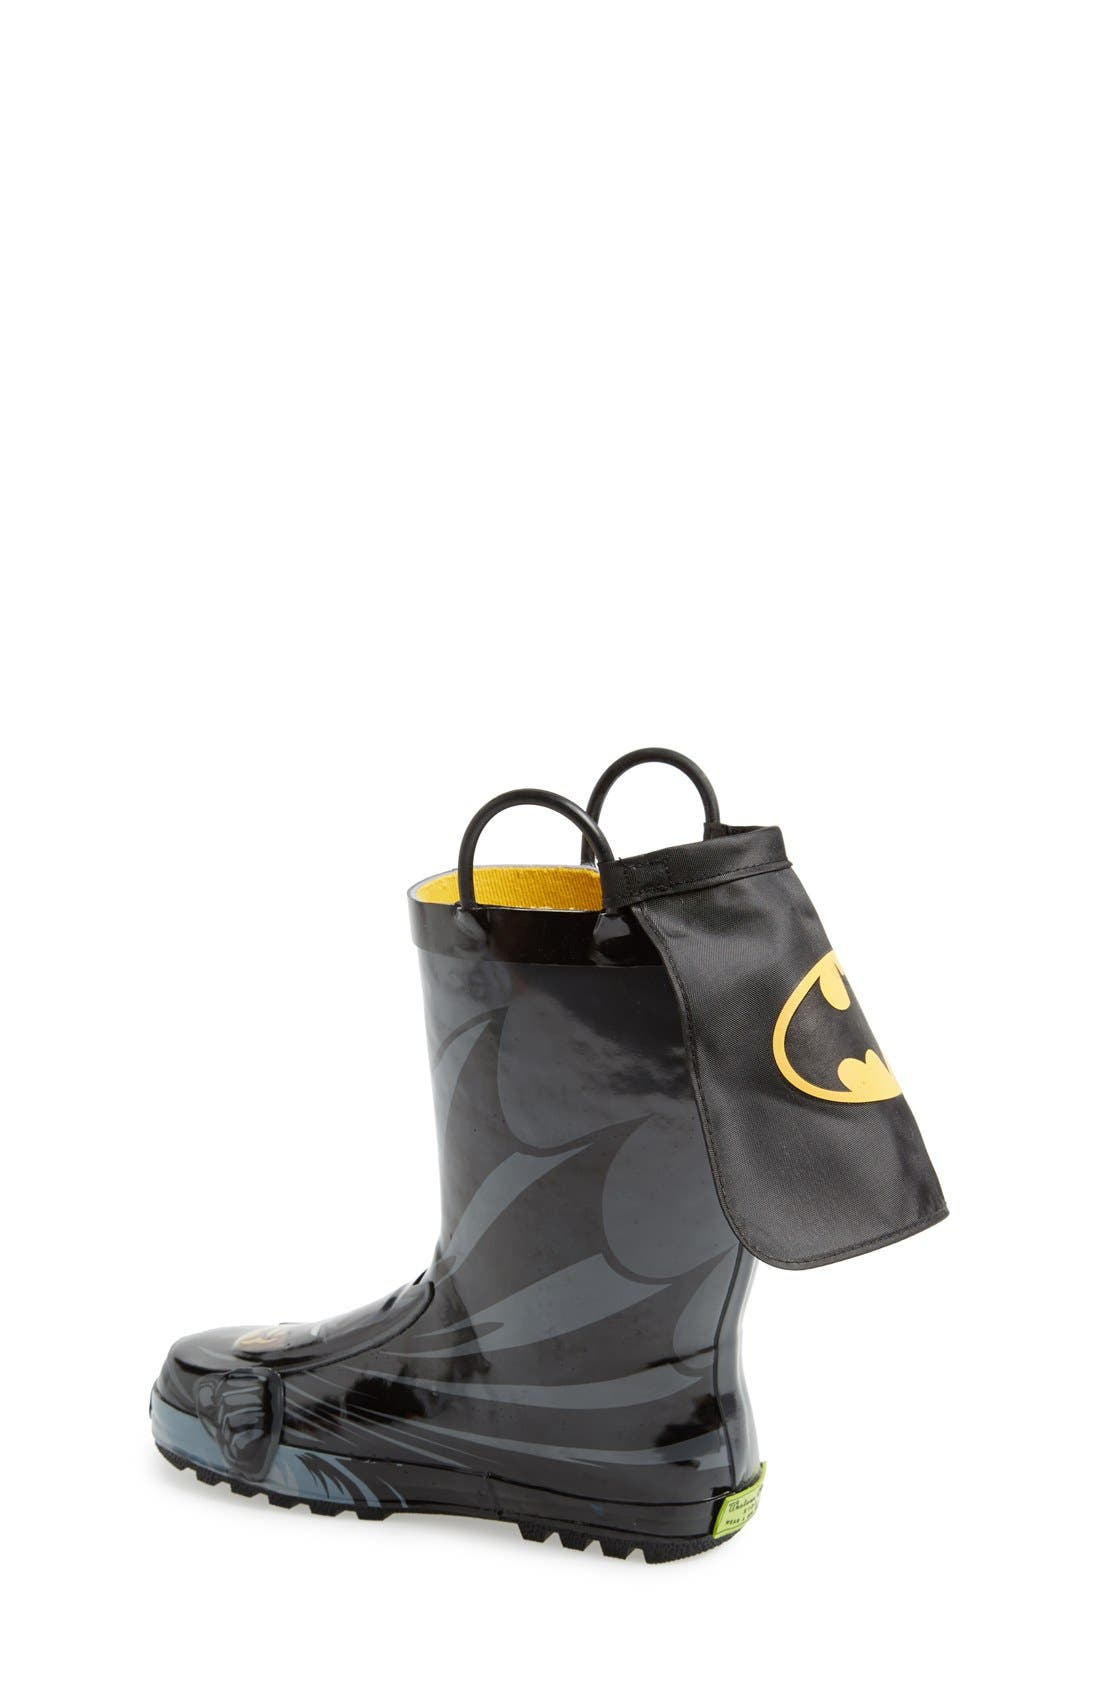 'Batman Everlasting' Waterproof Rain Boot,                             Alternate thumbnail 2, color,                             Black/ Black